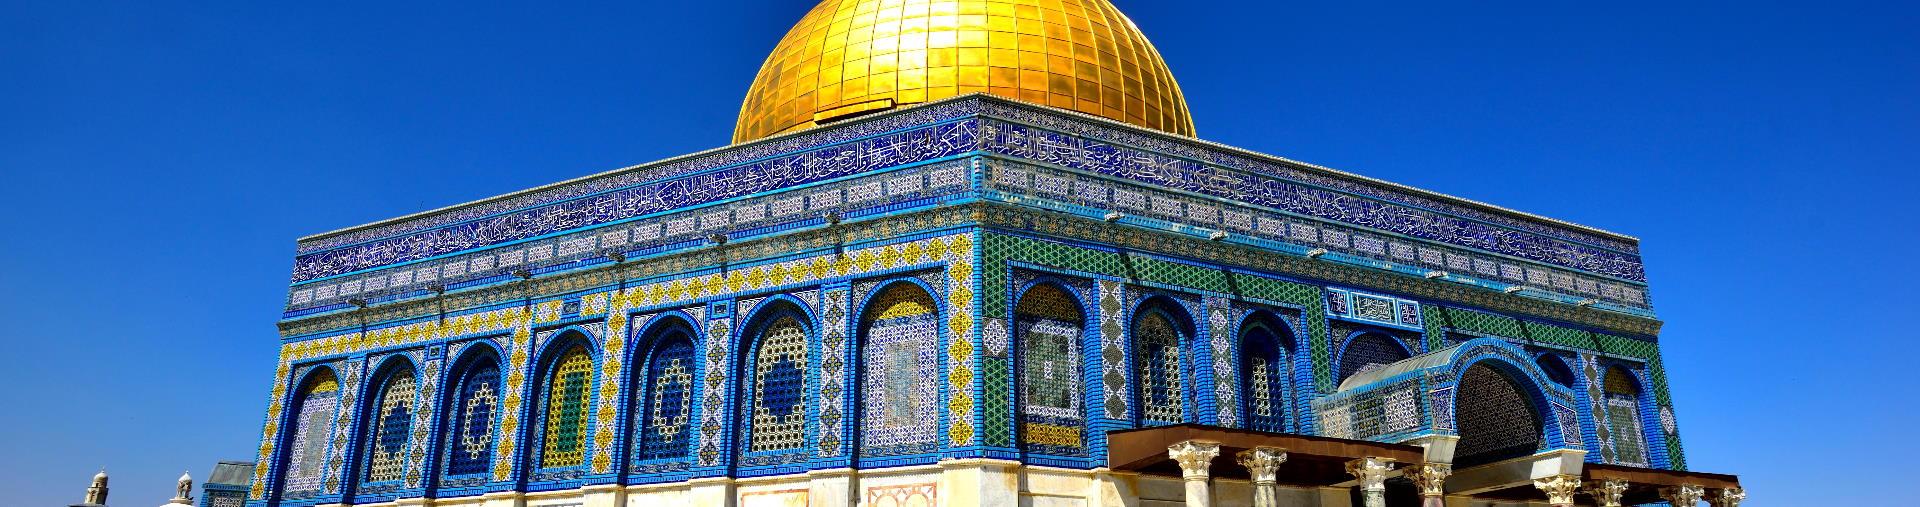 Muslim Quarters